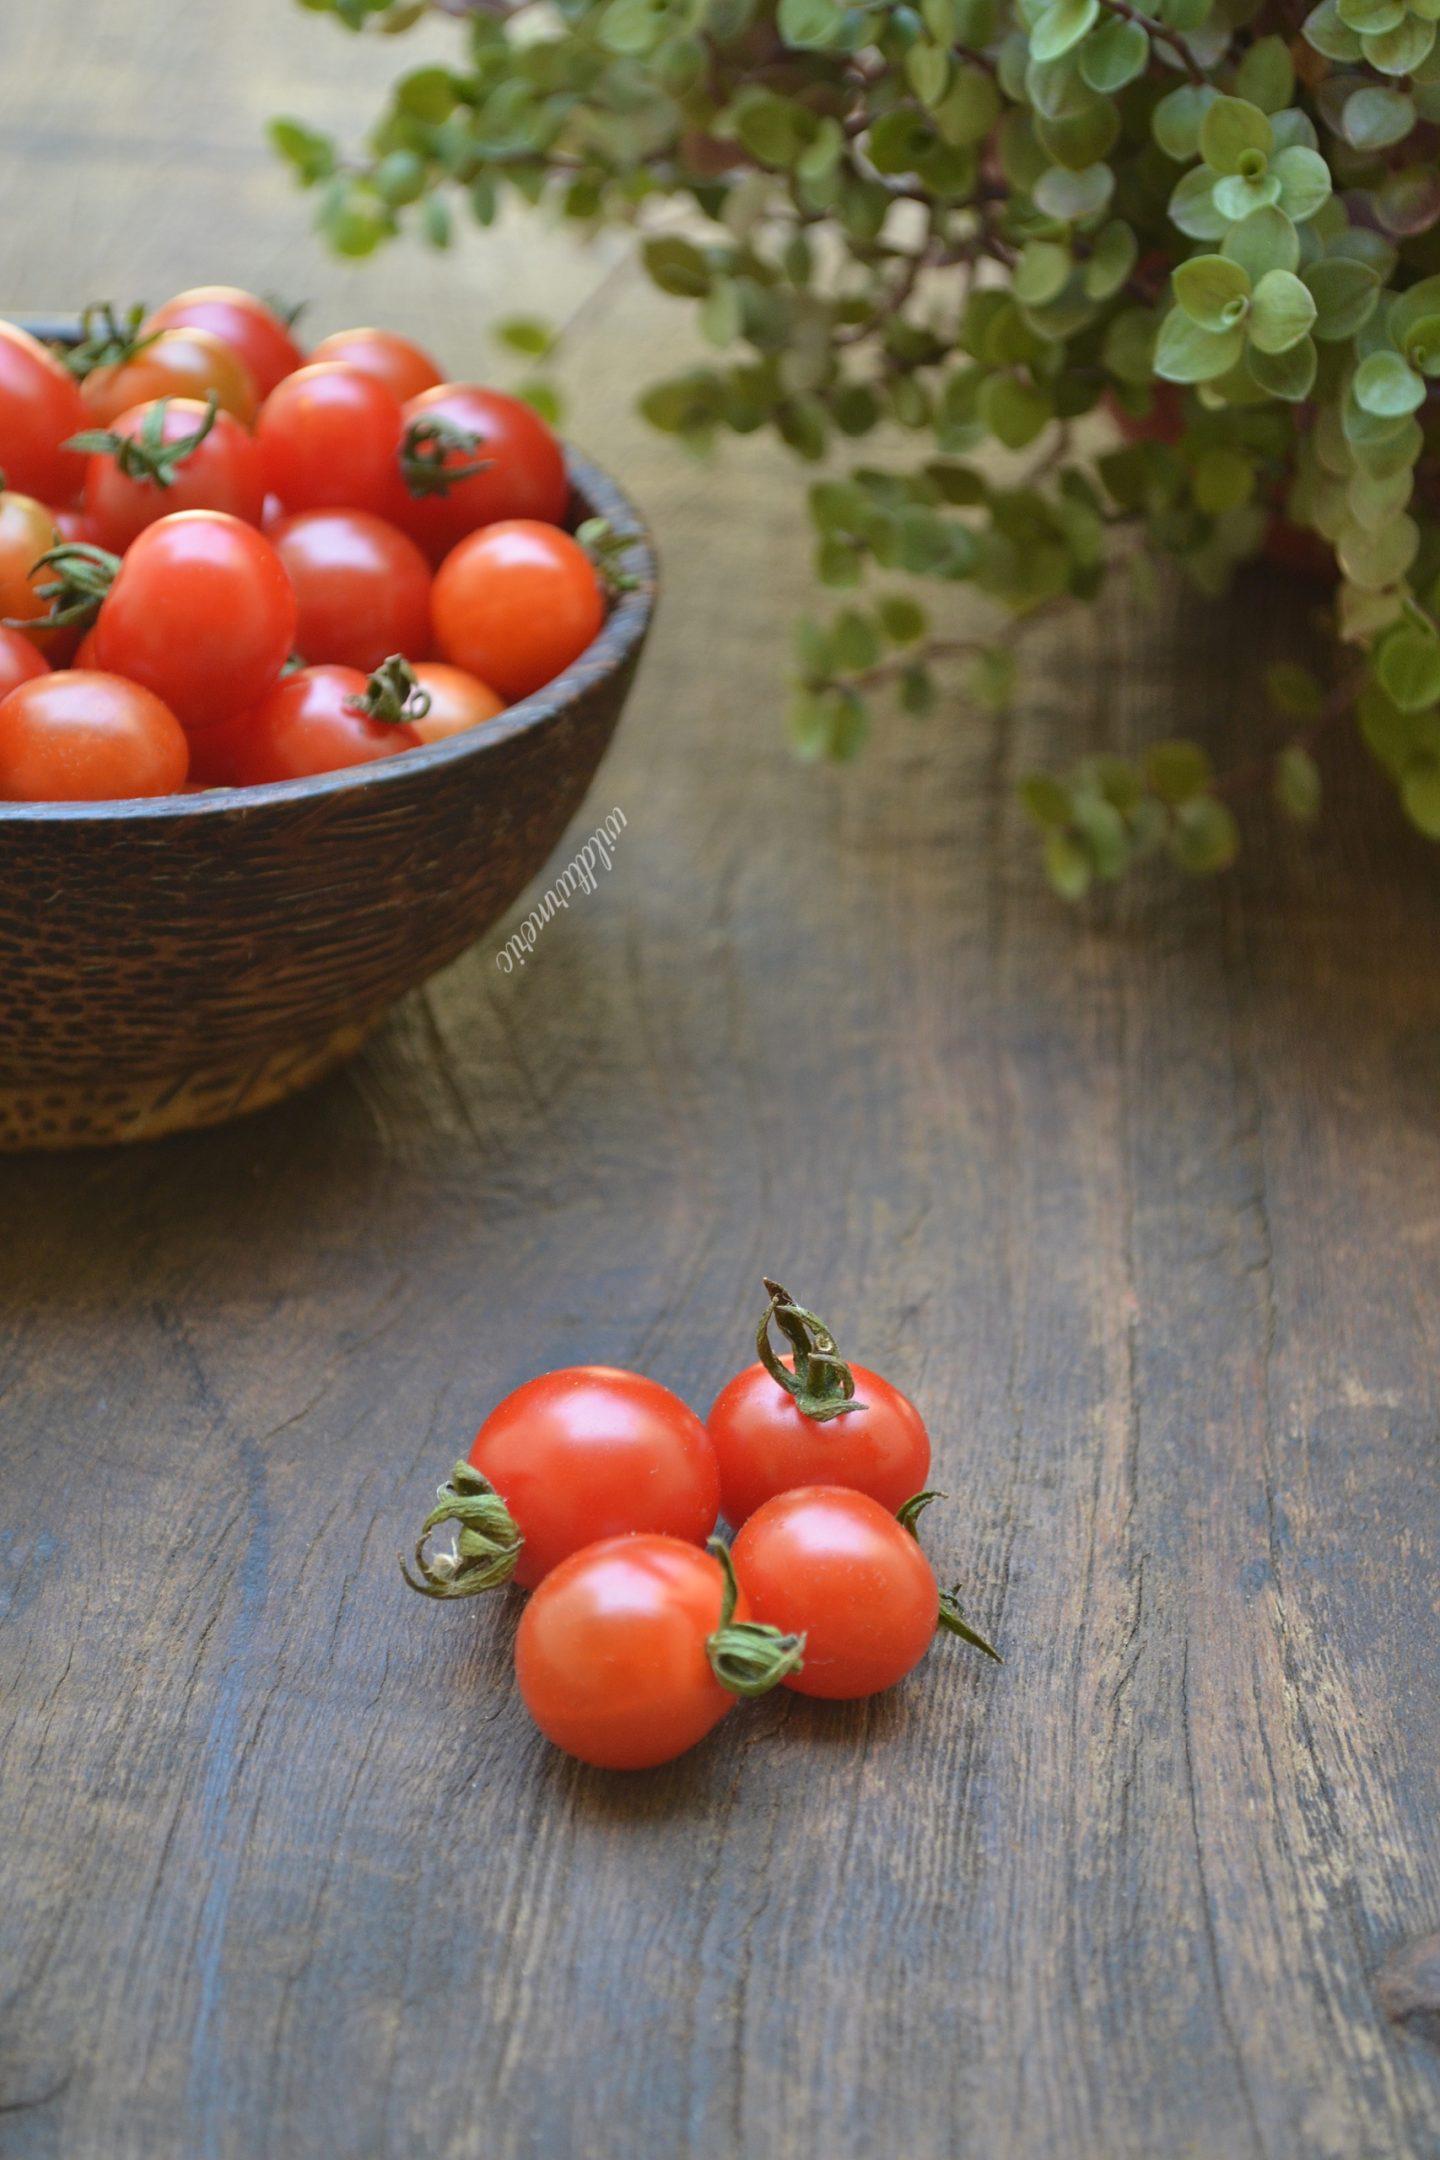 tomato medicinal uses